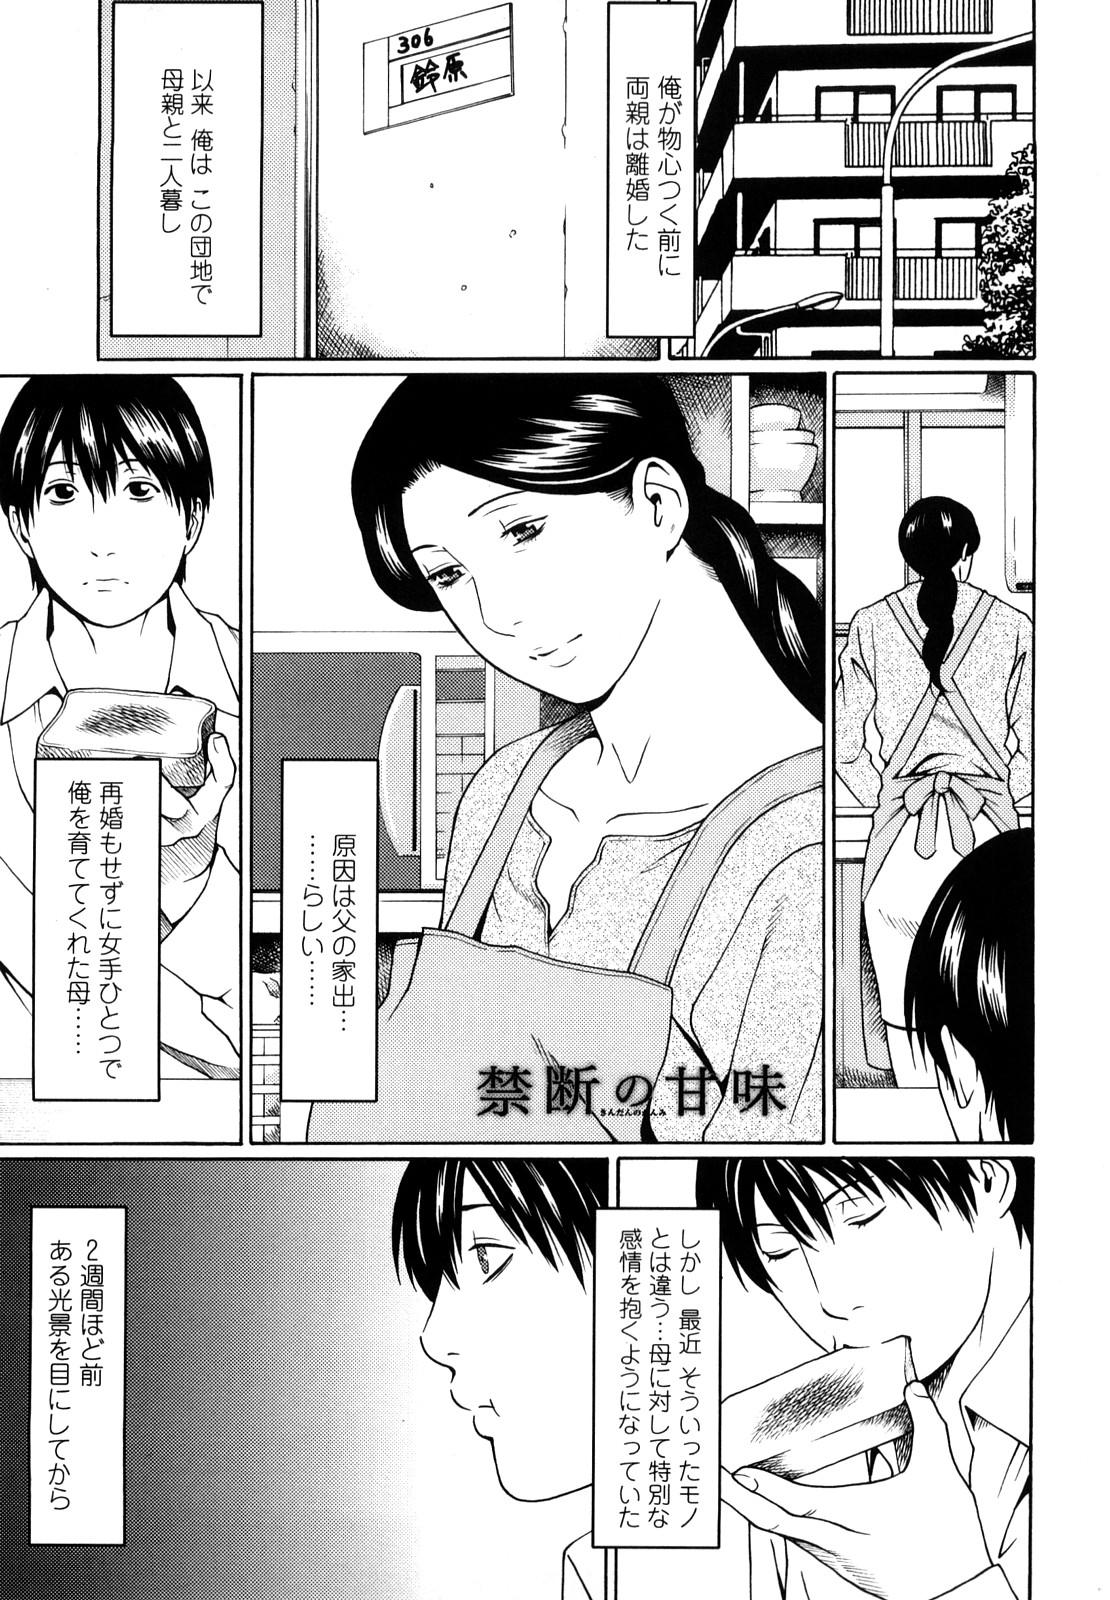 [Takasugi Kou] Kindan no Haha-Ana - Immorality Love-Hole [Decensored] 22